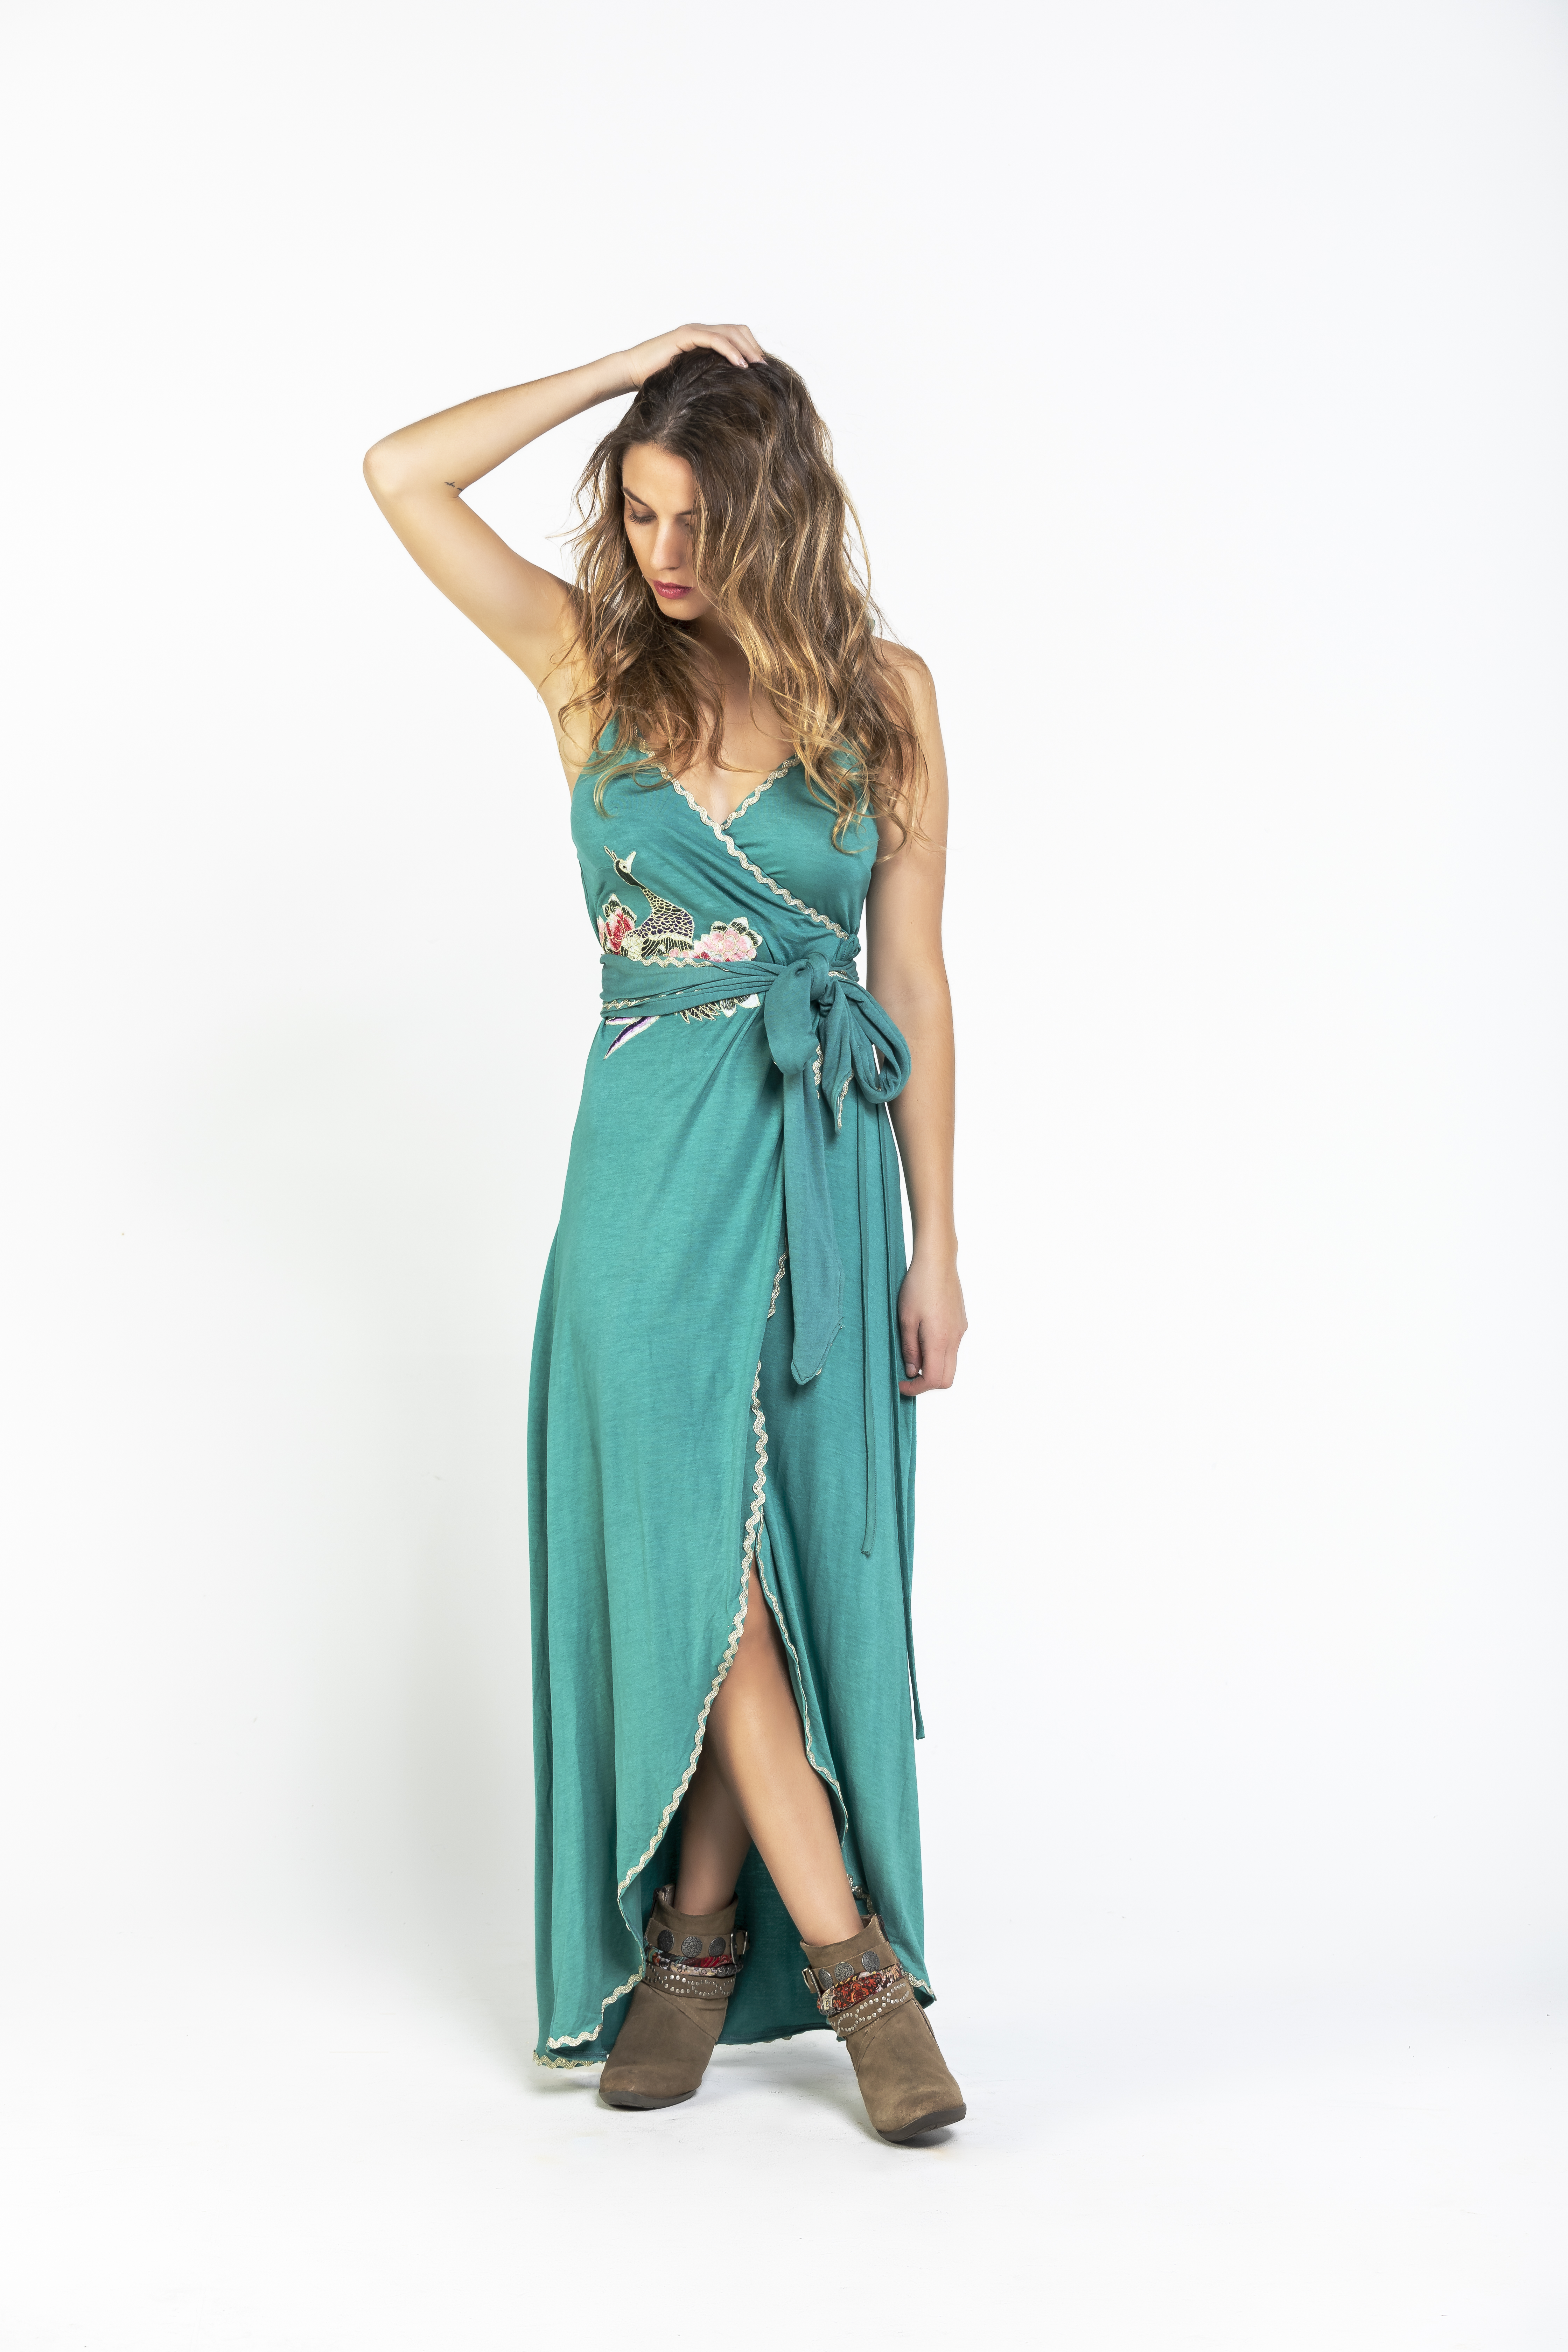 Savage Culture: Sea Green Tied Waist Maxi Dress Riverside SAVAGE_36071